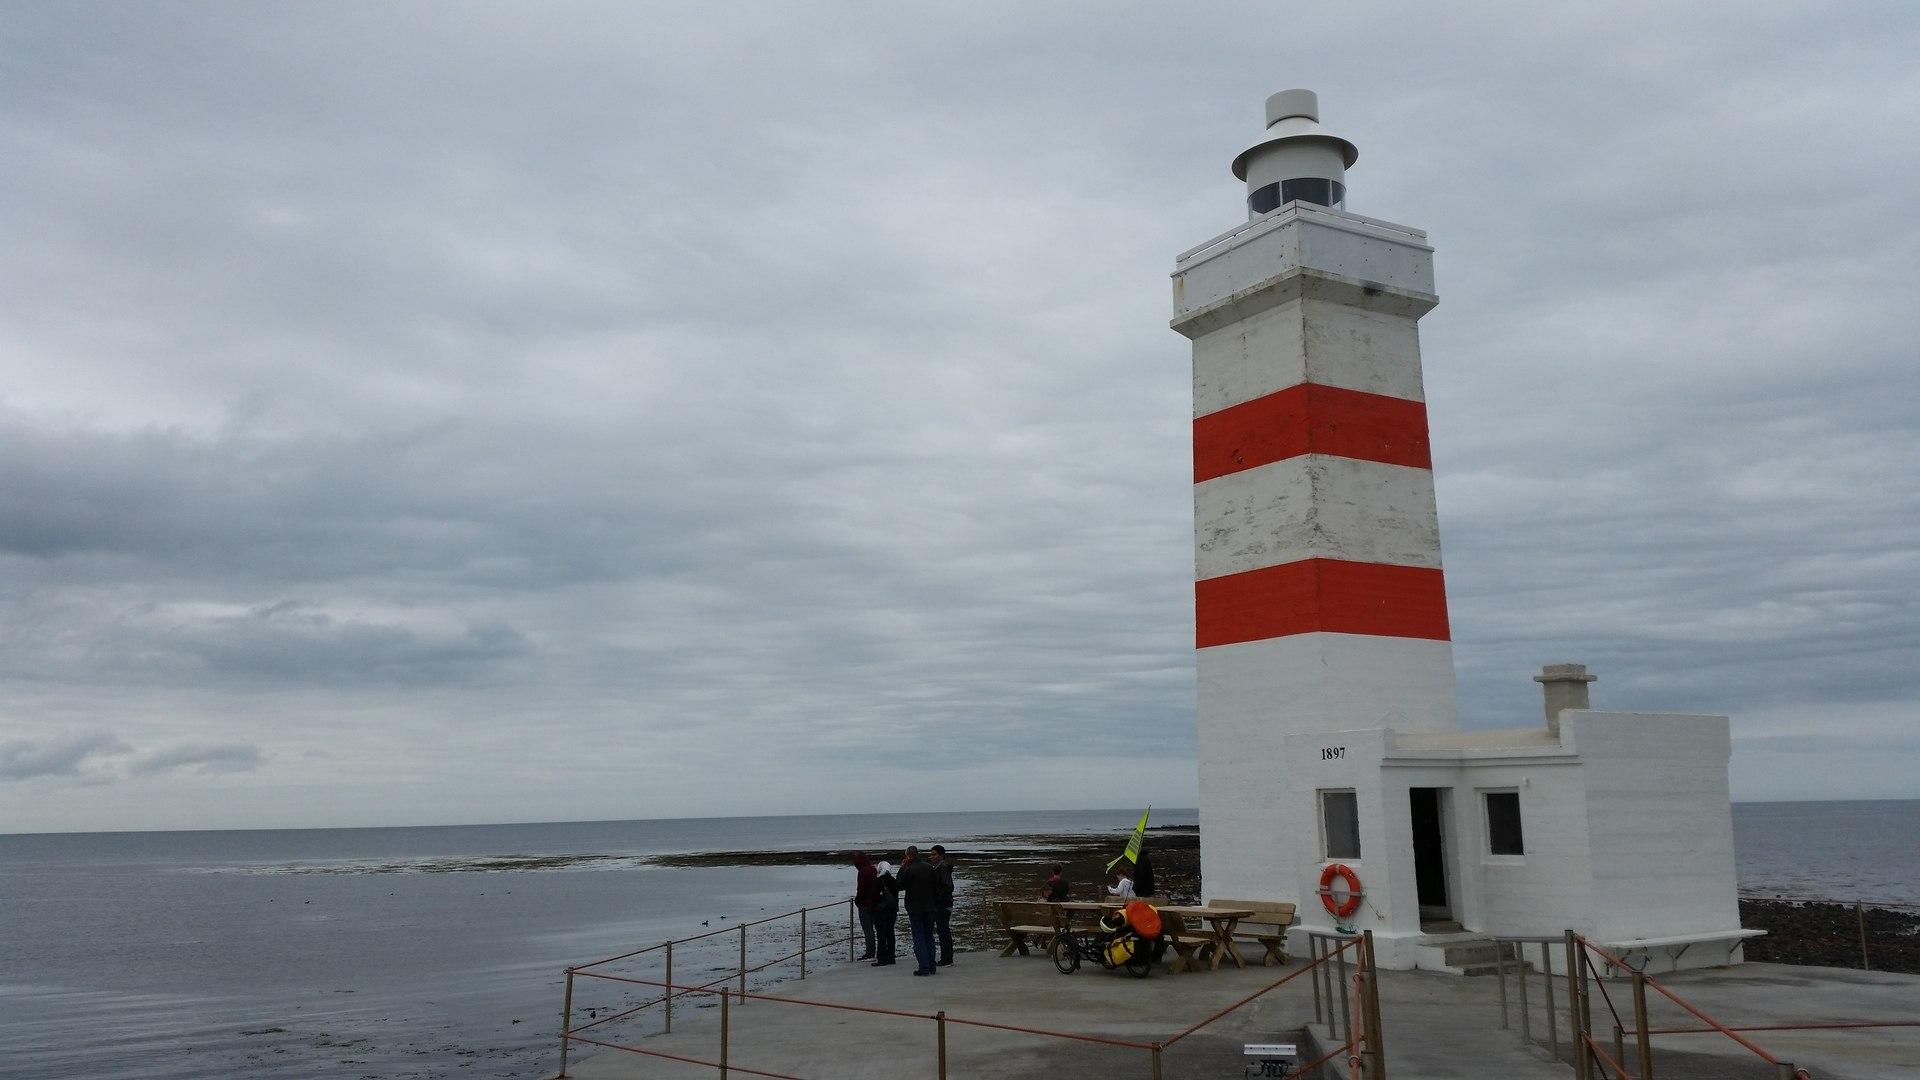 17 juillet : de Reykjavik à Sandgerdi